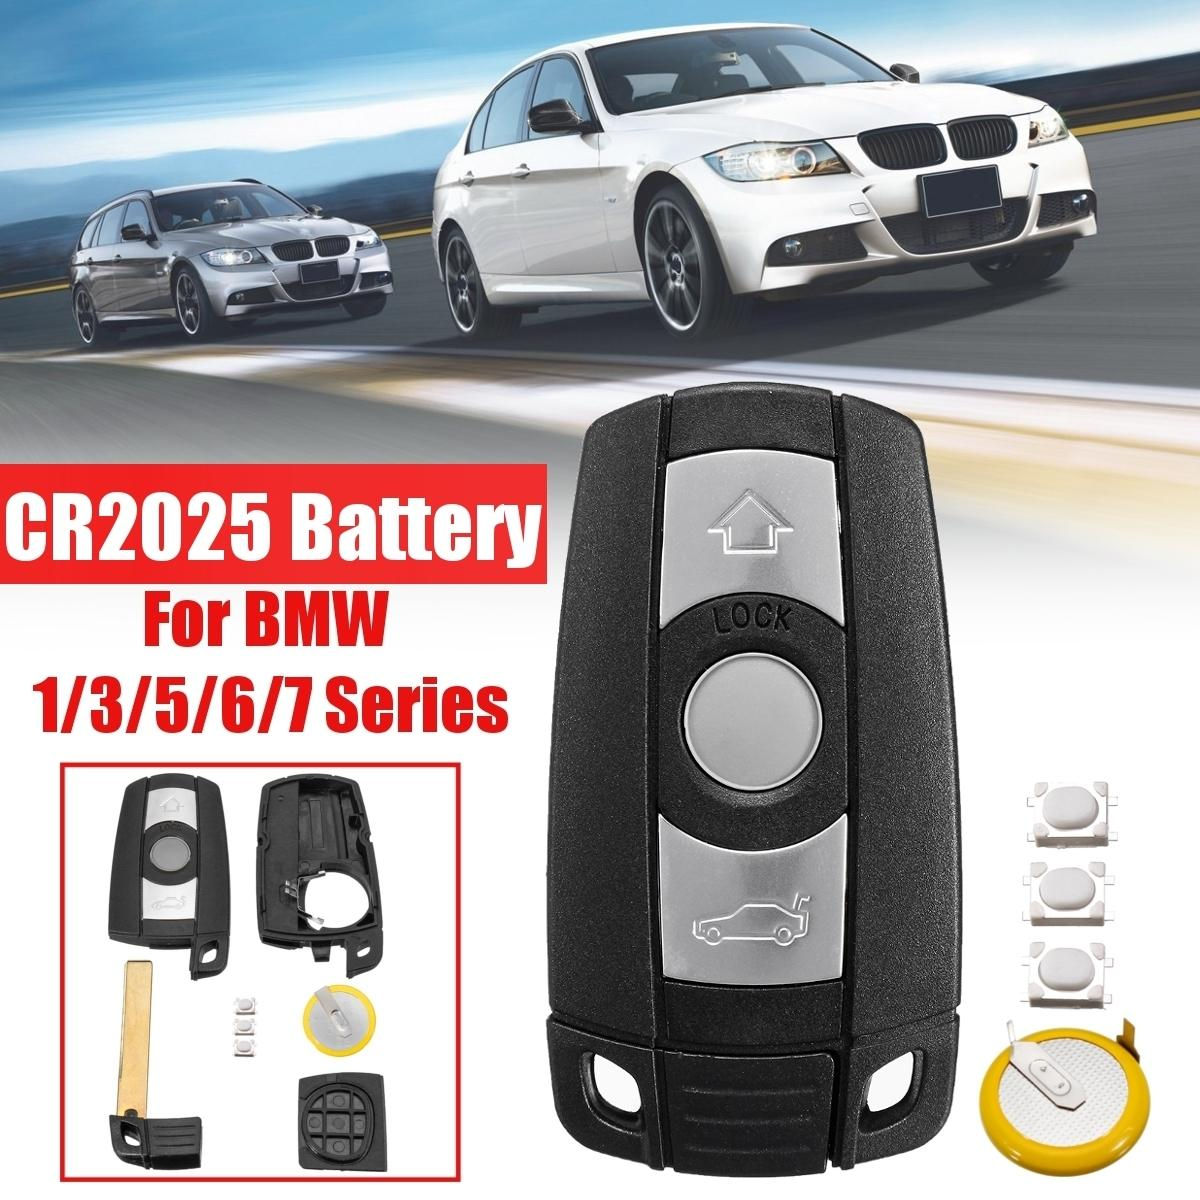 With Blade Battery Remote 3 Button Car Key Shell Case Styling Cover Trim For Bmw 1 3 5 6 7 Series E90 E92 E93 E60 E61 X1 X5 X6